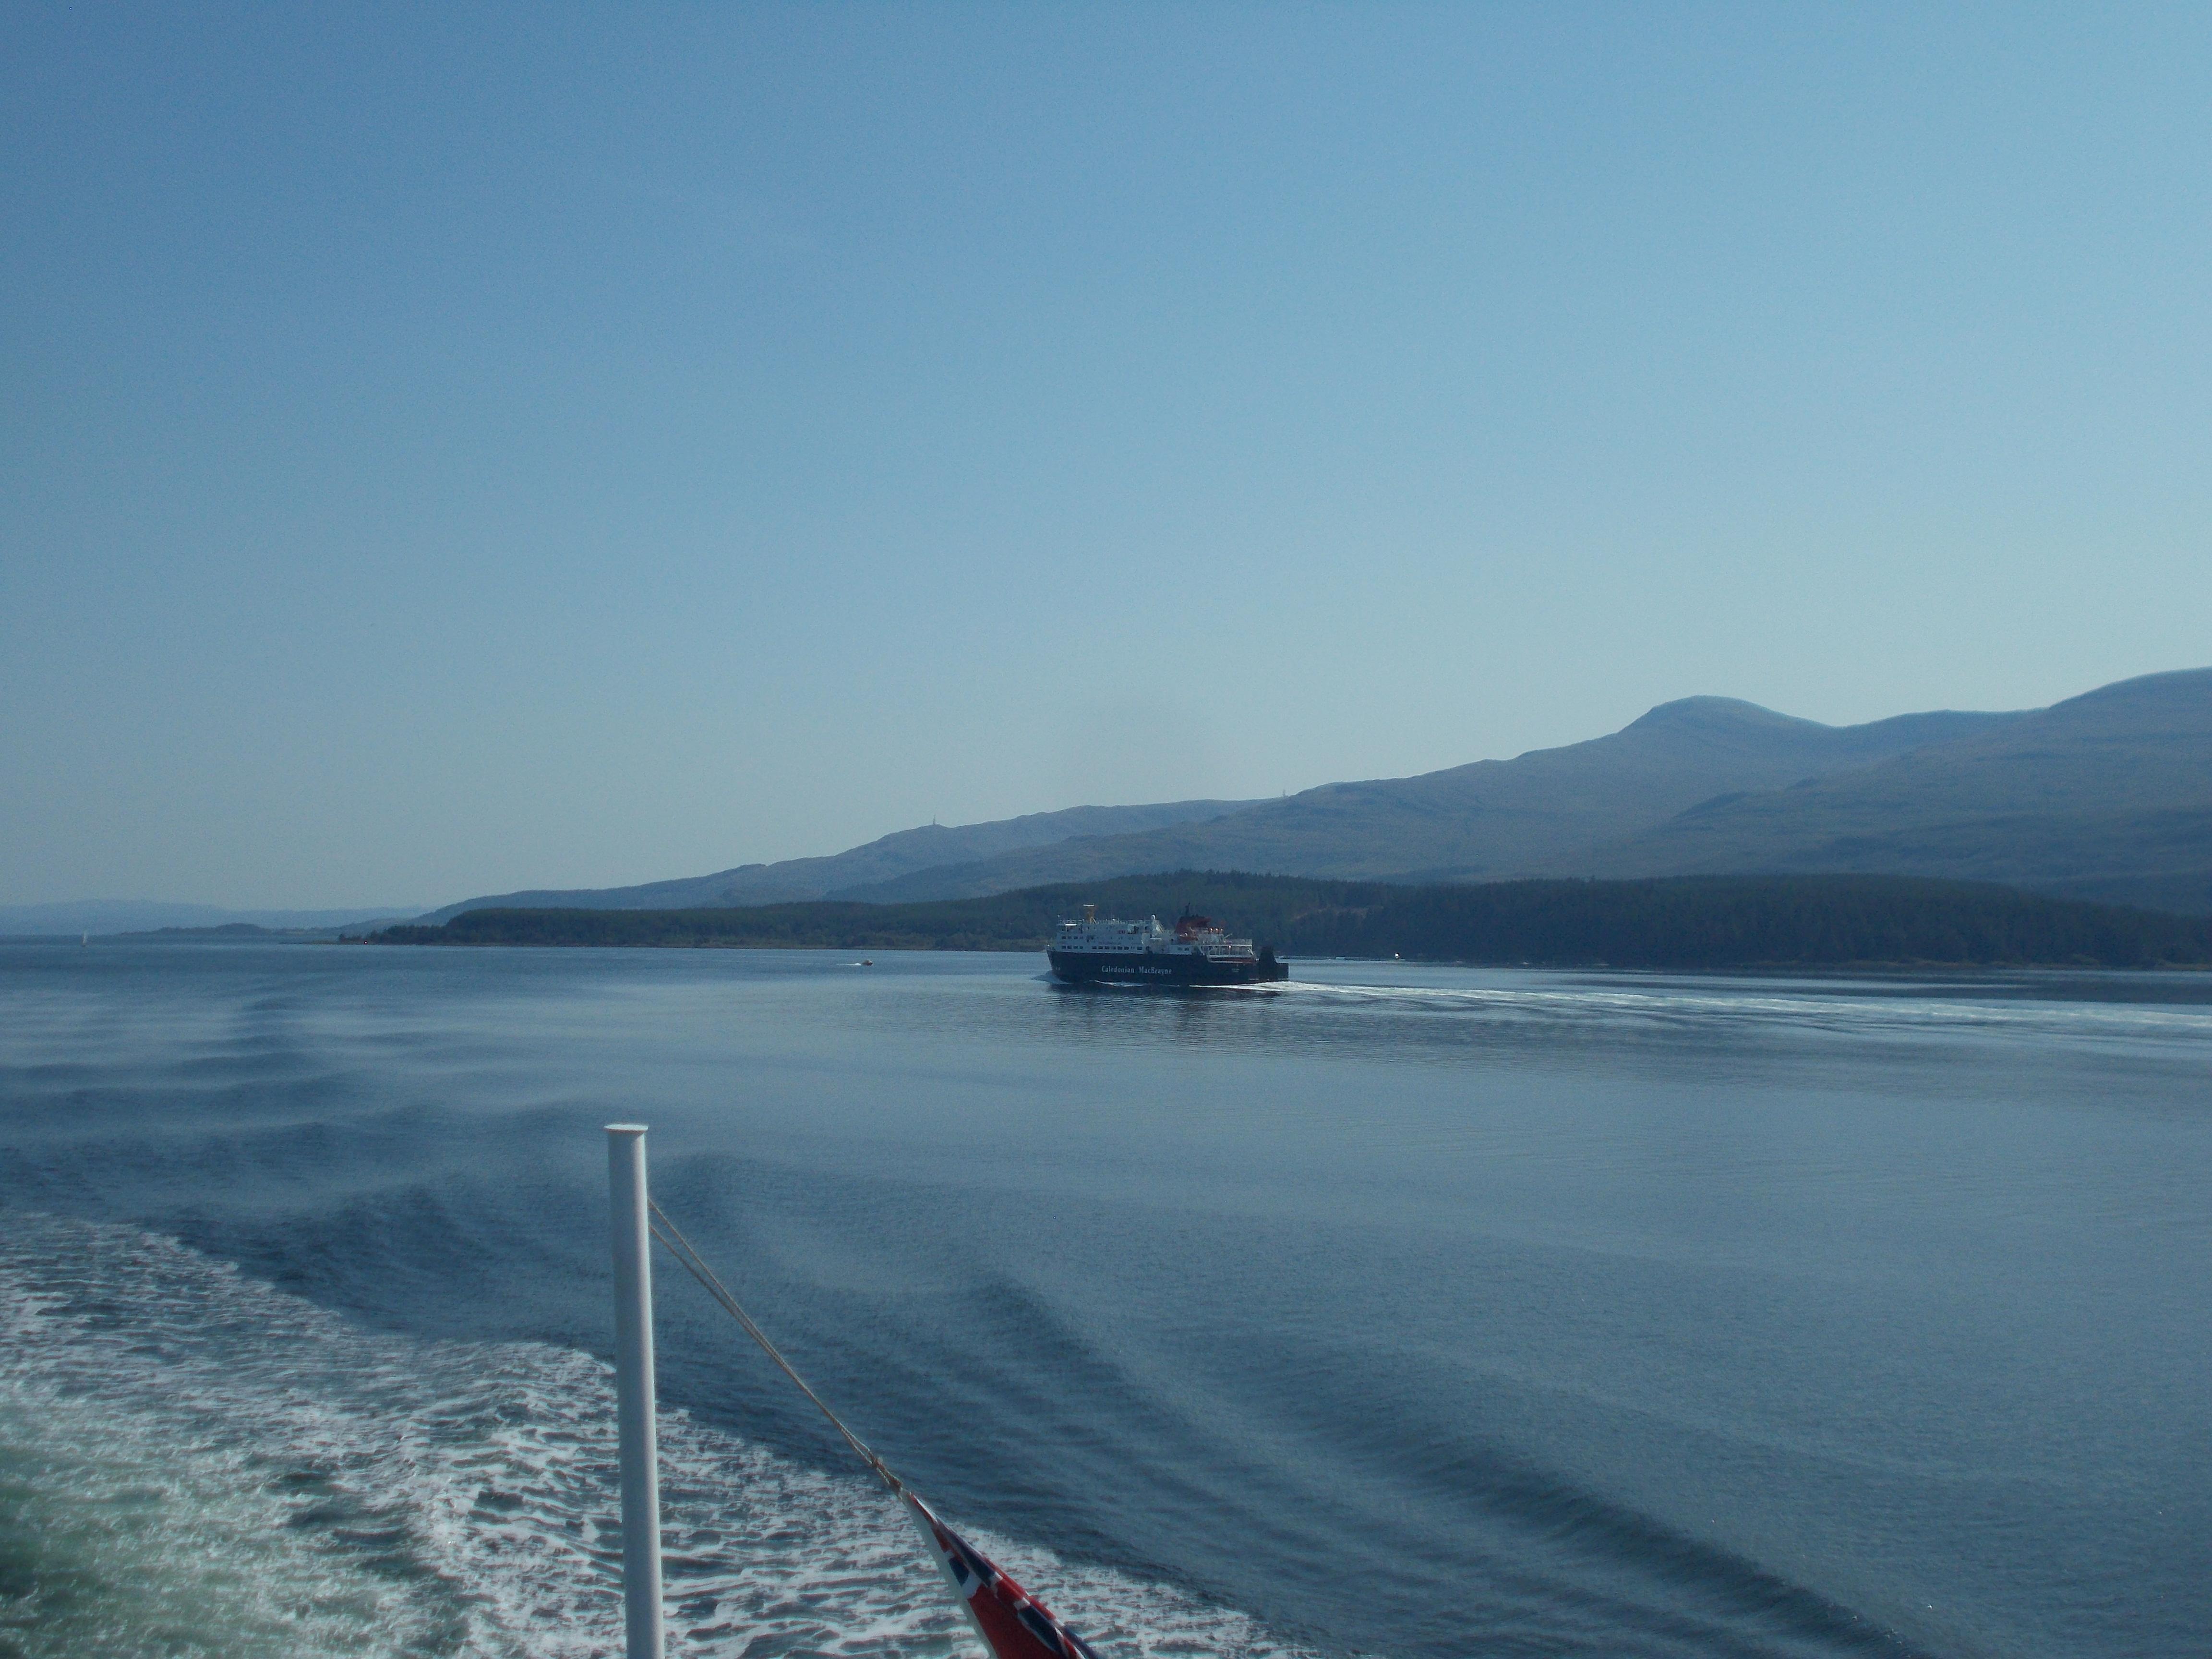 Oban to Castlebay